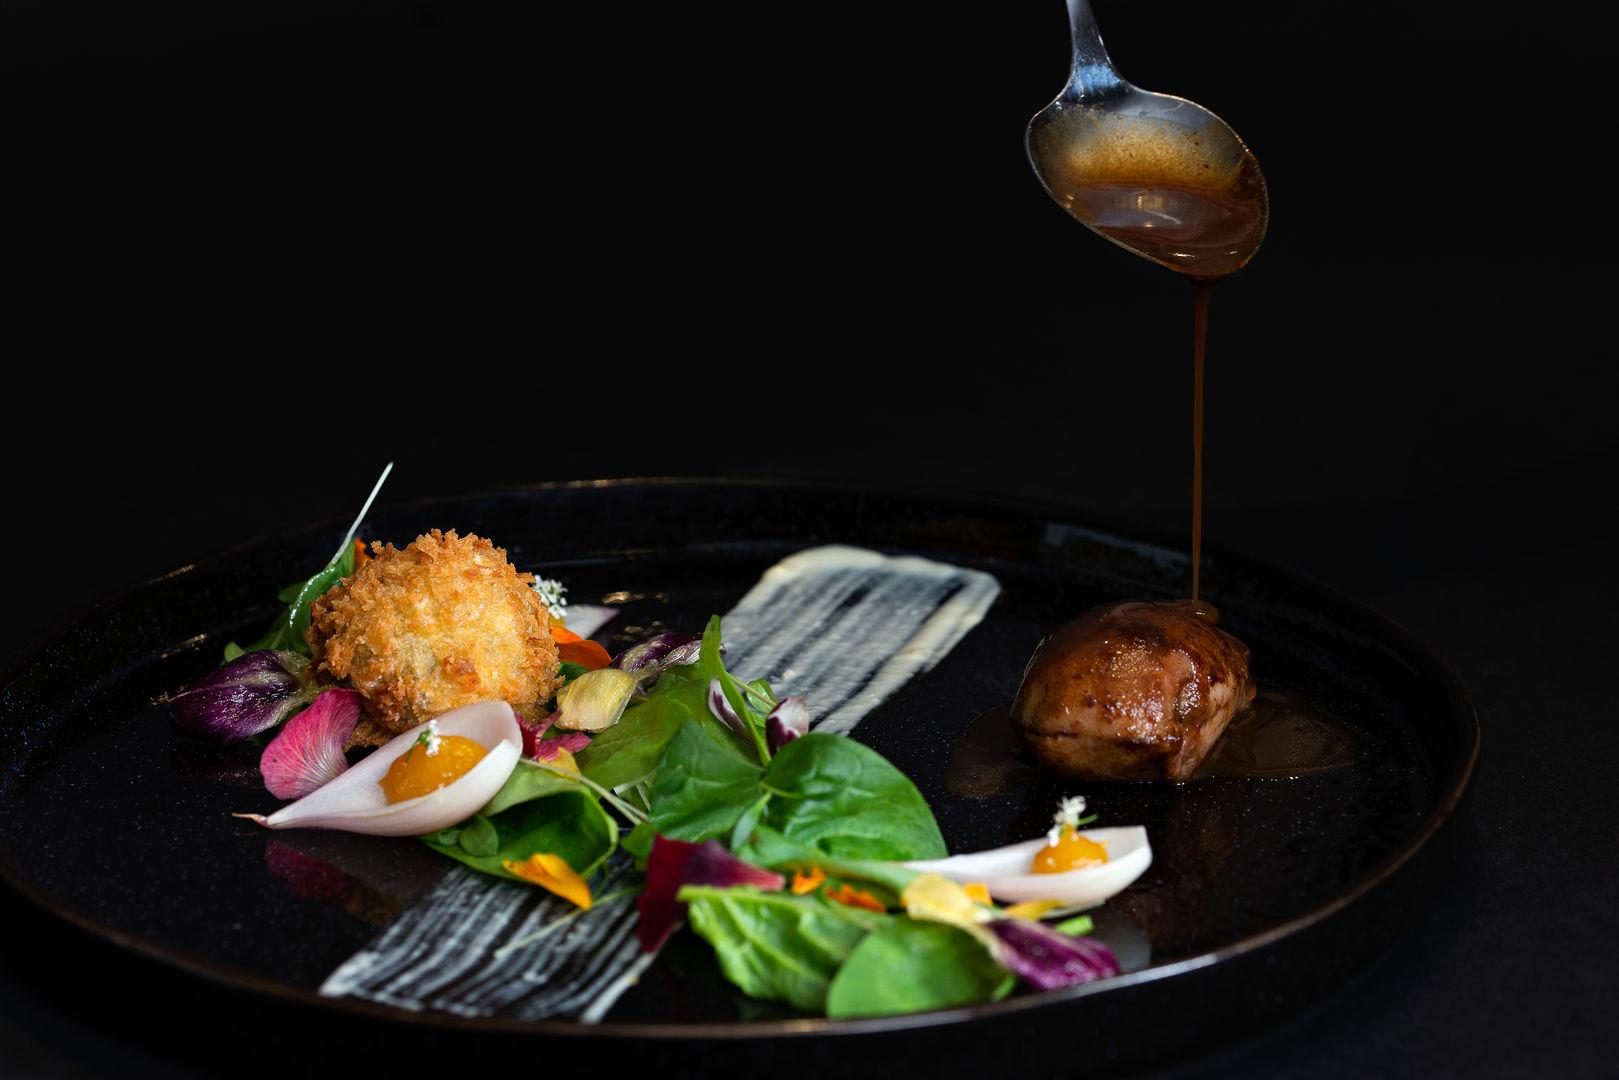 Hôtel_restaurant_Edgar_saint-brieuc_plat_2